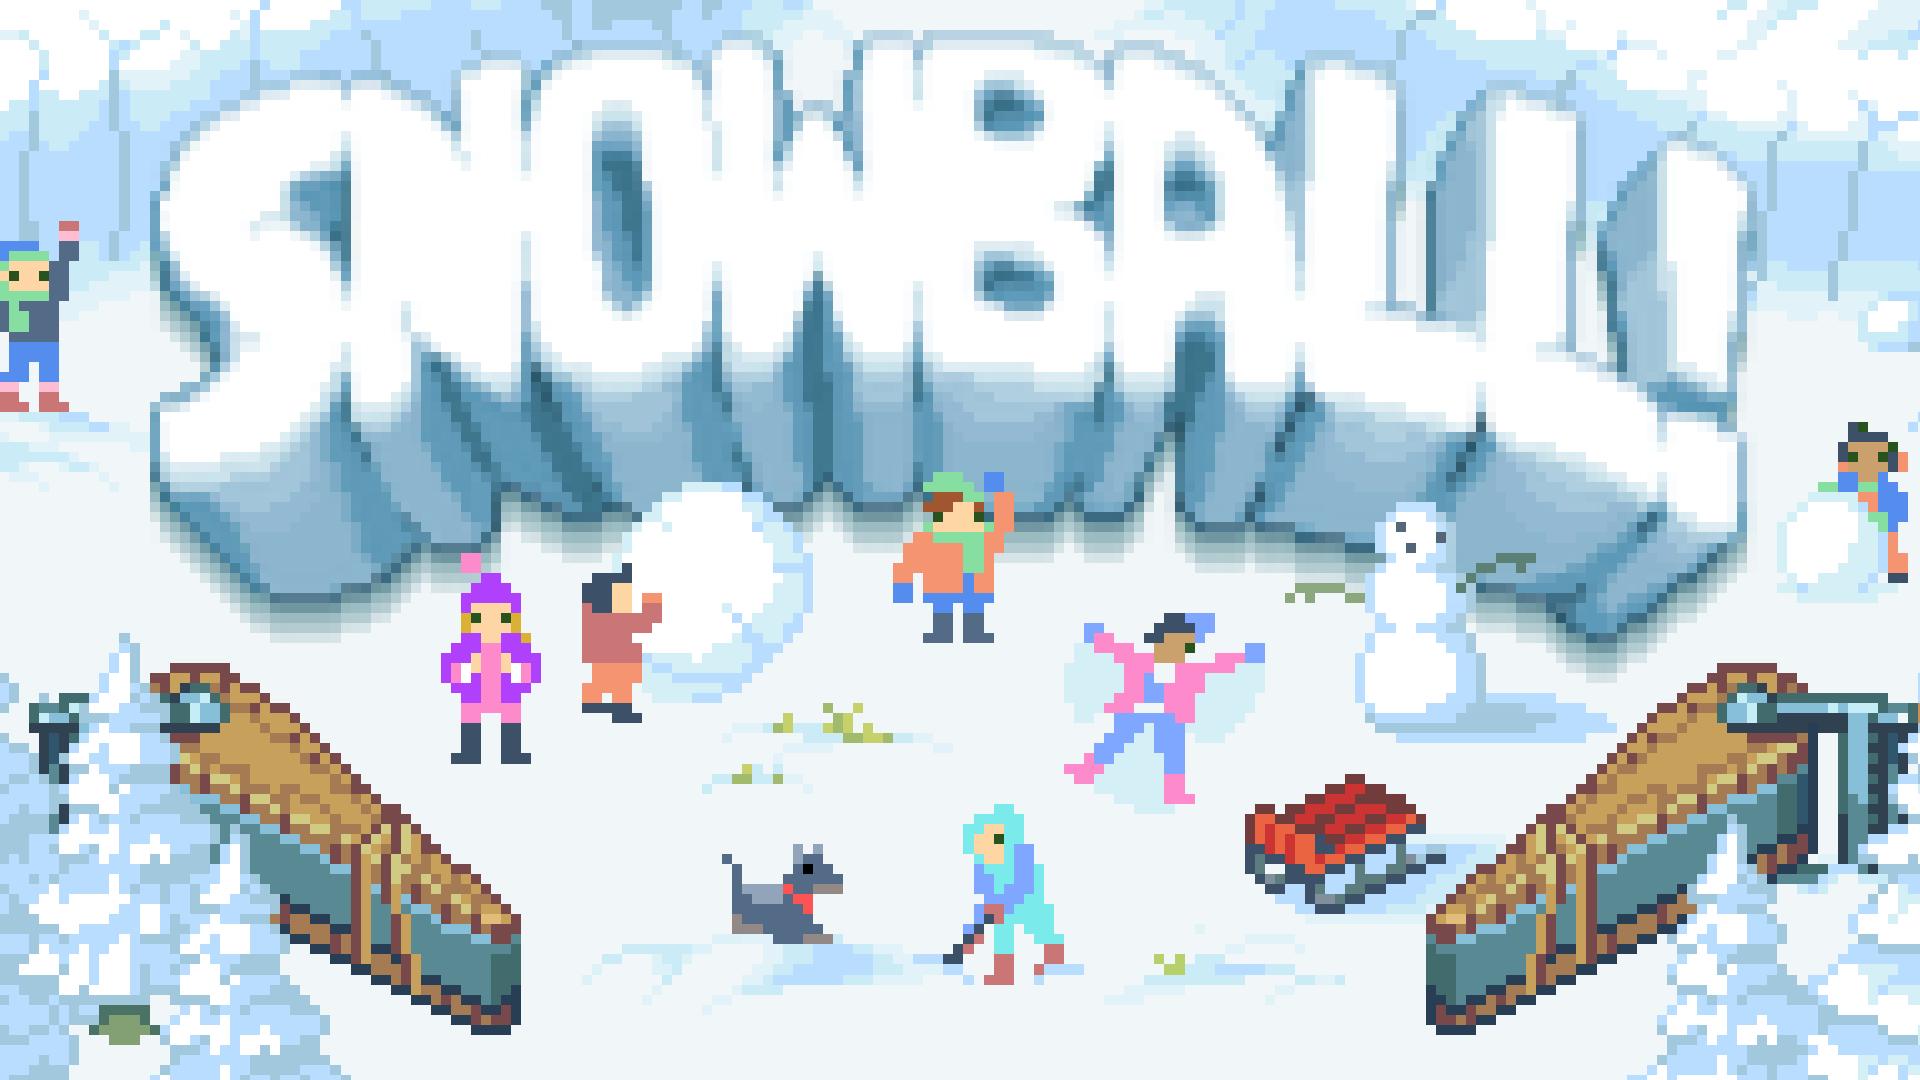 SNOWBALL!